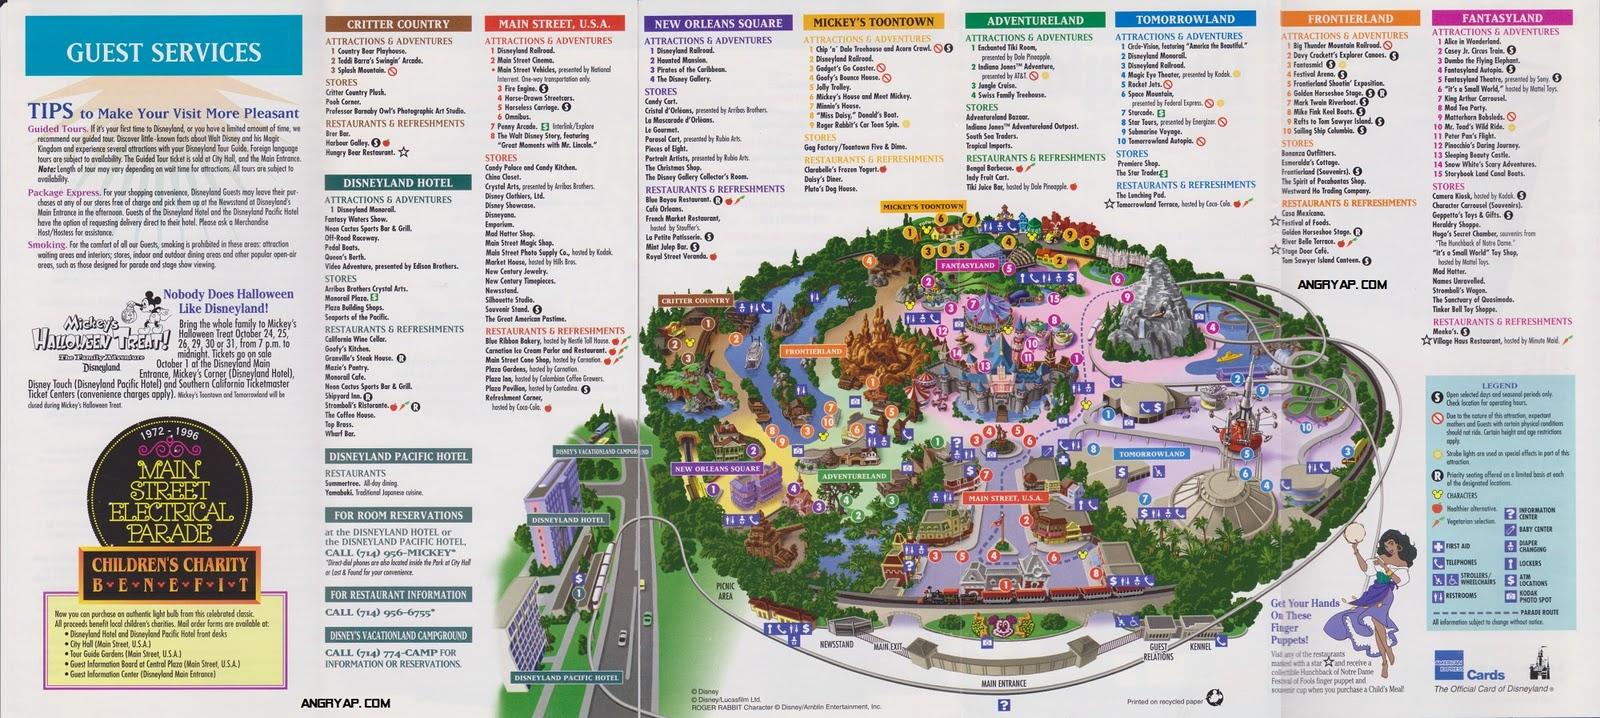 AP - Disneyland and Walt Disney World nostalgia: Disneyland Guide Map ...